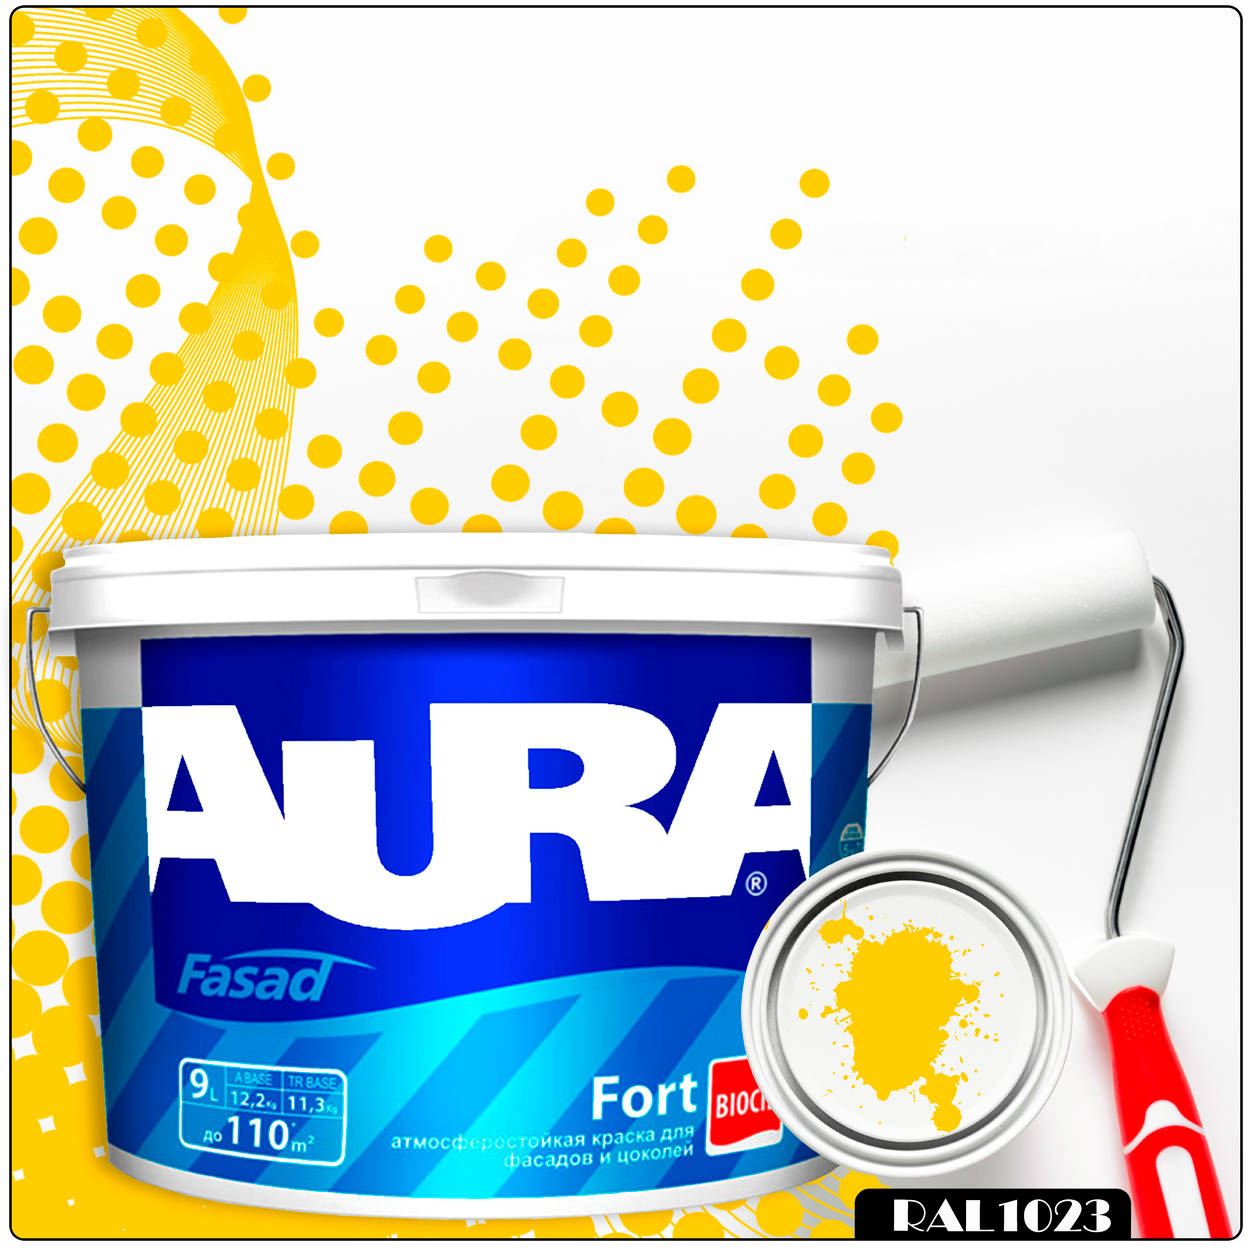 Фото 20 - Краска Aura Fasad Fort, RAL 1023 Транспортно-жёлтый, латексная, матовая, для фасада и цоколей, 9л, Аура.